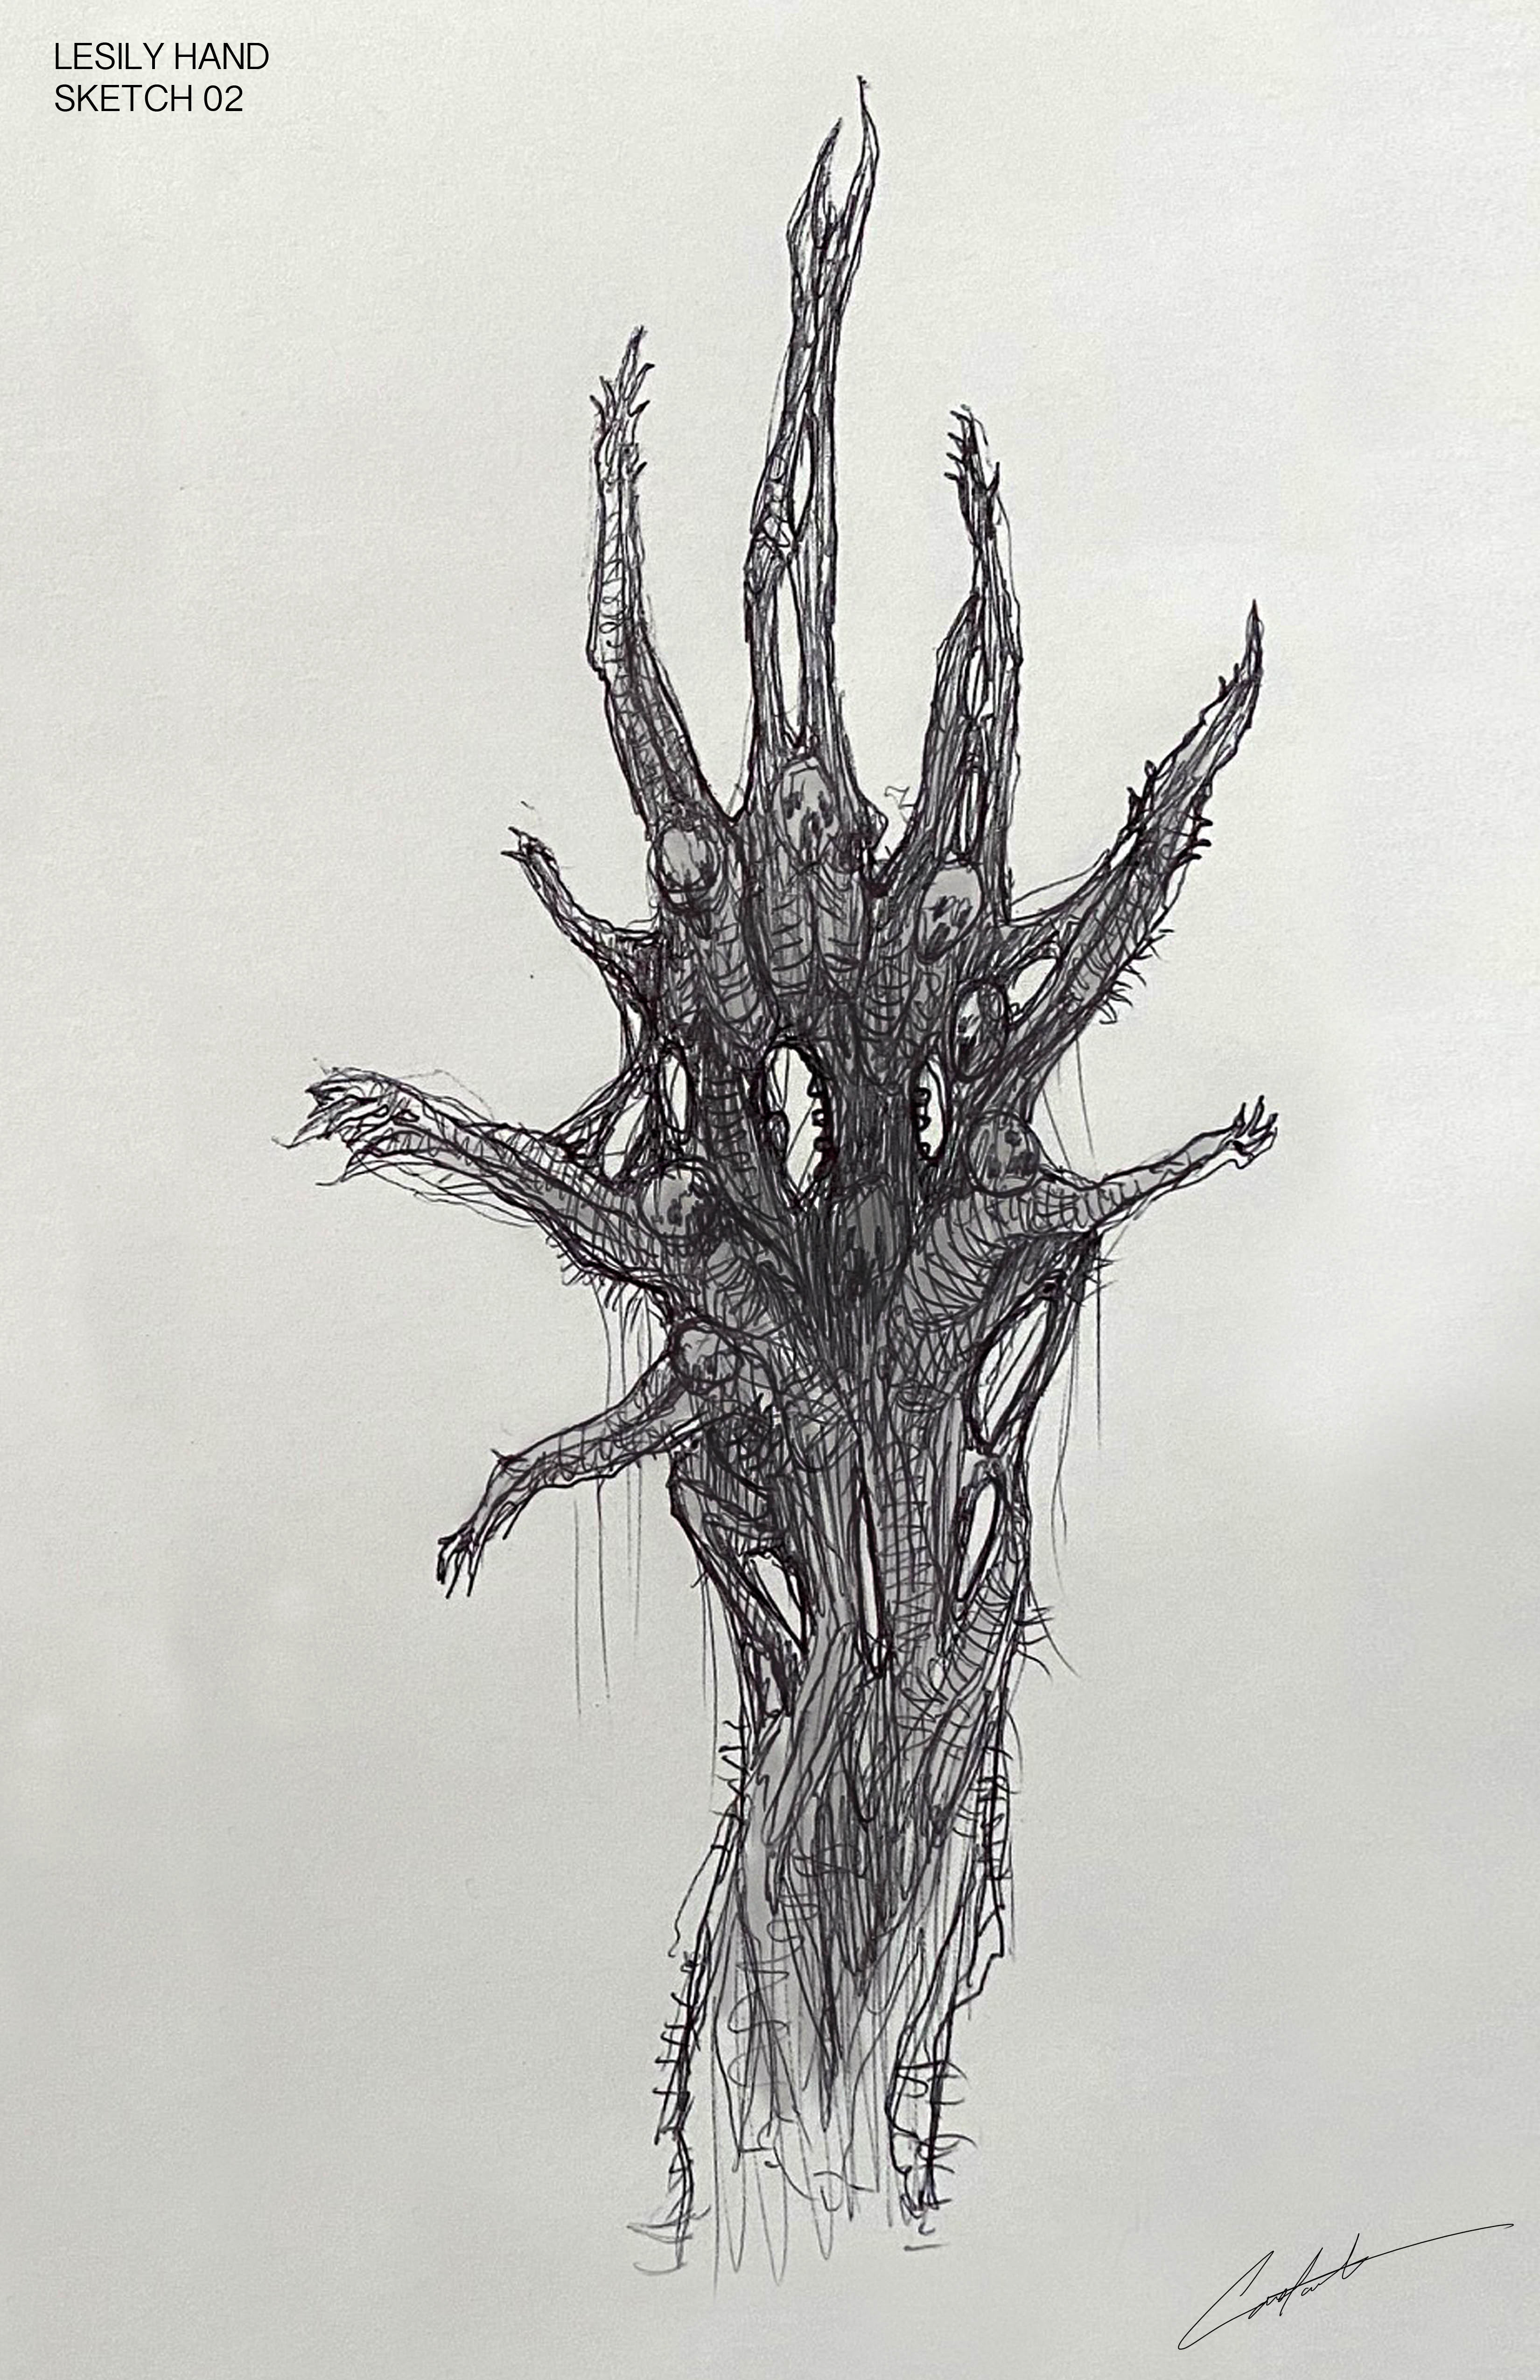 Lisey's Story creature design